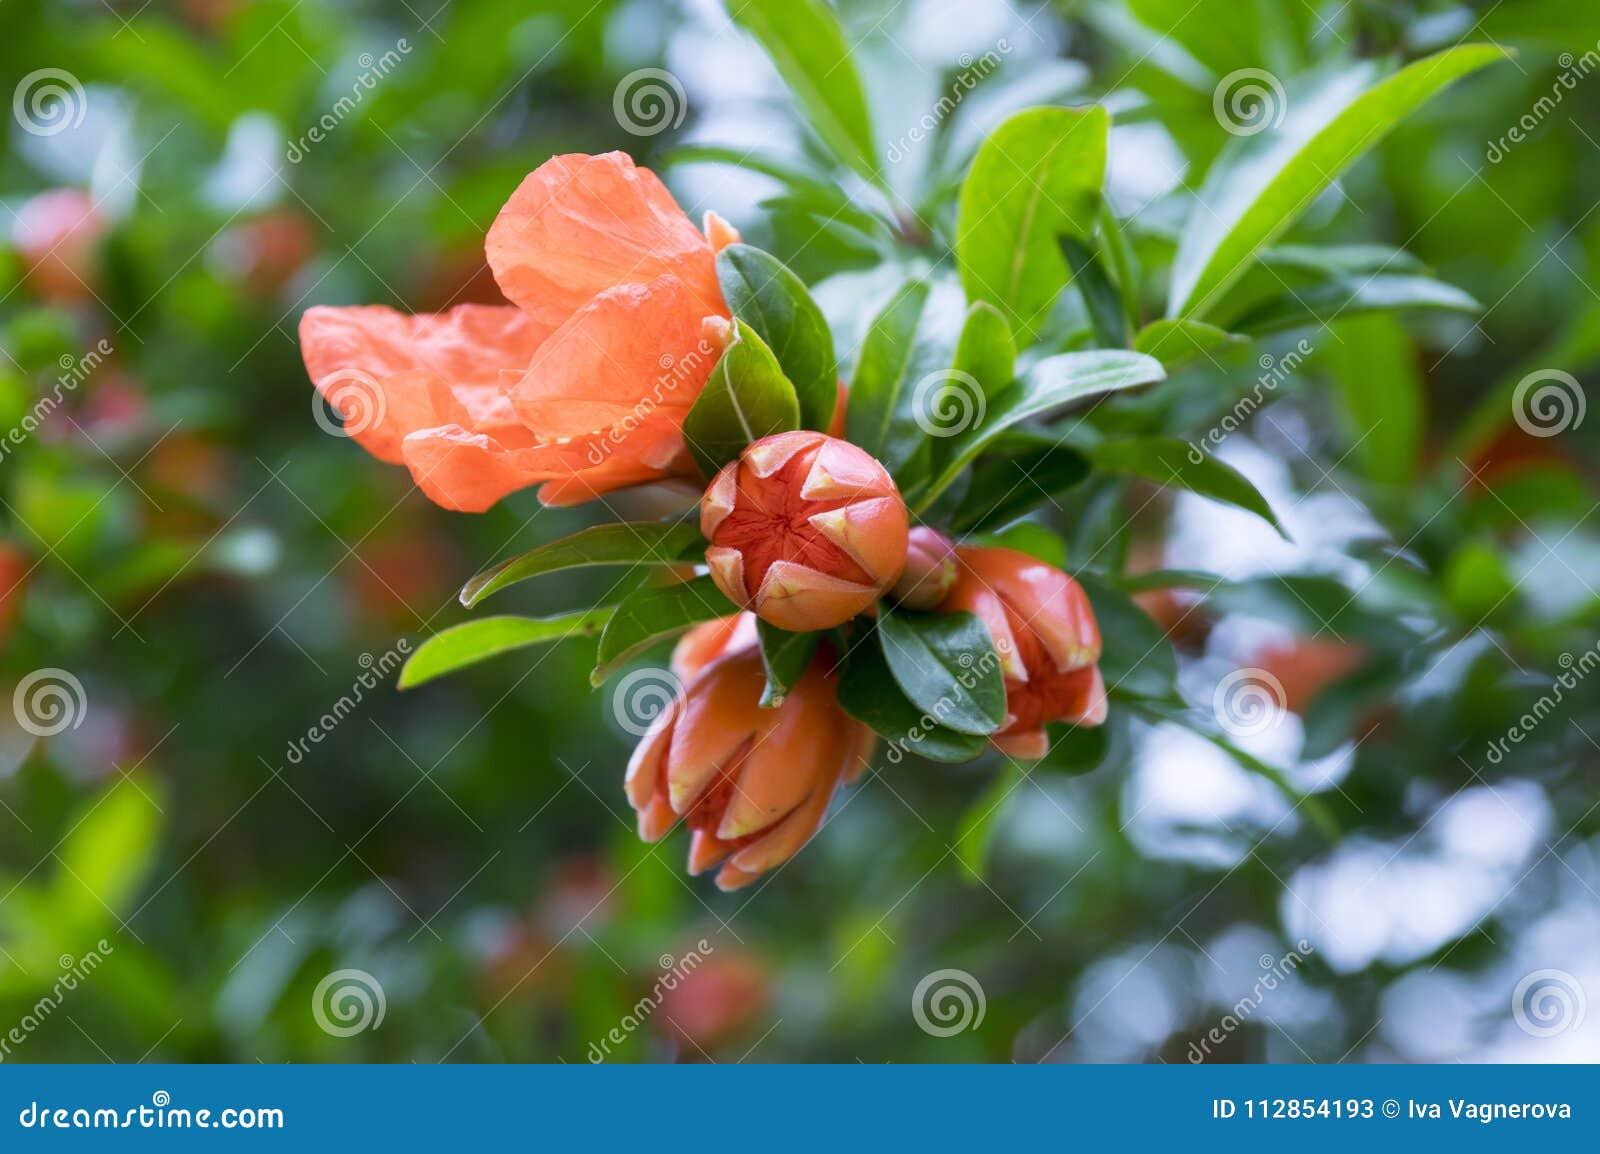 Punica Granatum Pomegranate Tree In Bloom Stock Image